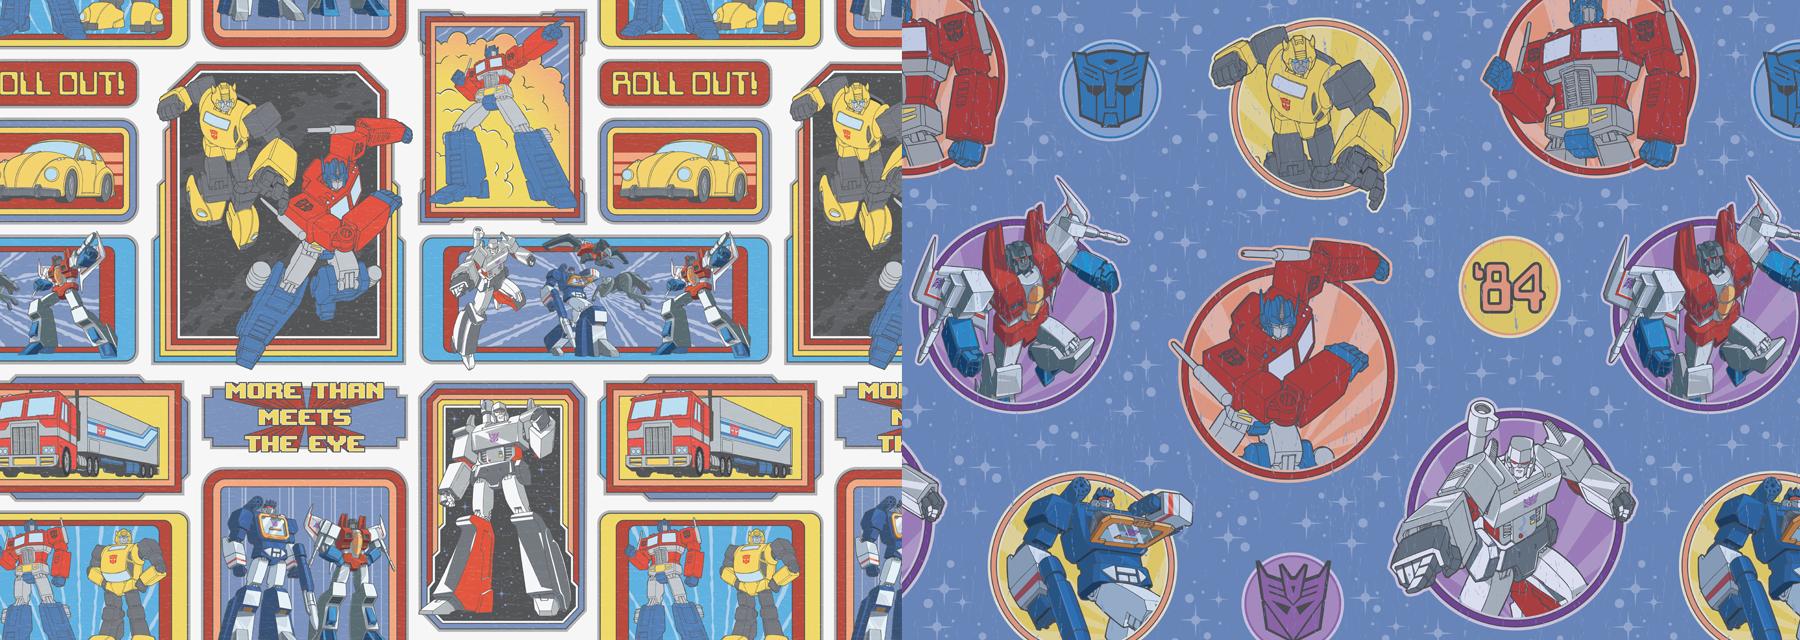 TF Gen 1: 1984 Arcade Style Guide Design - ID 4